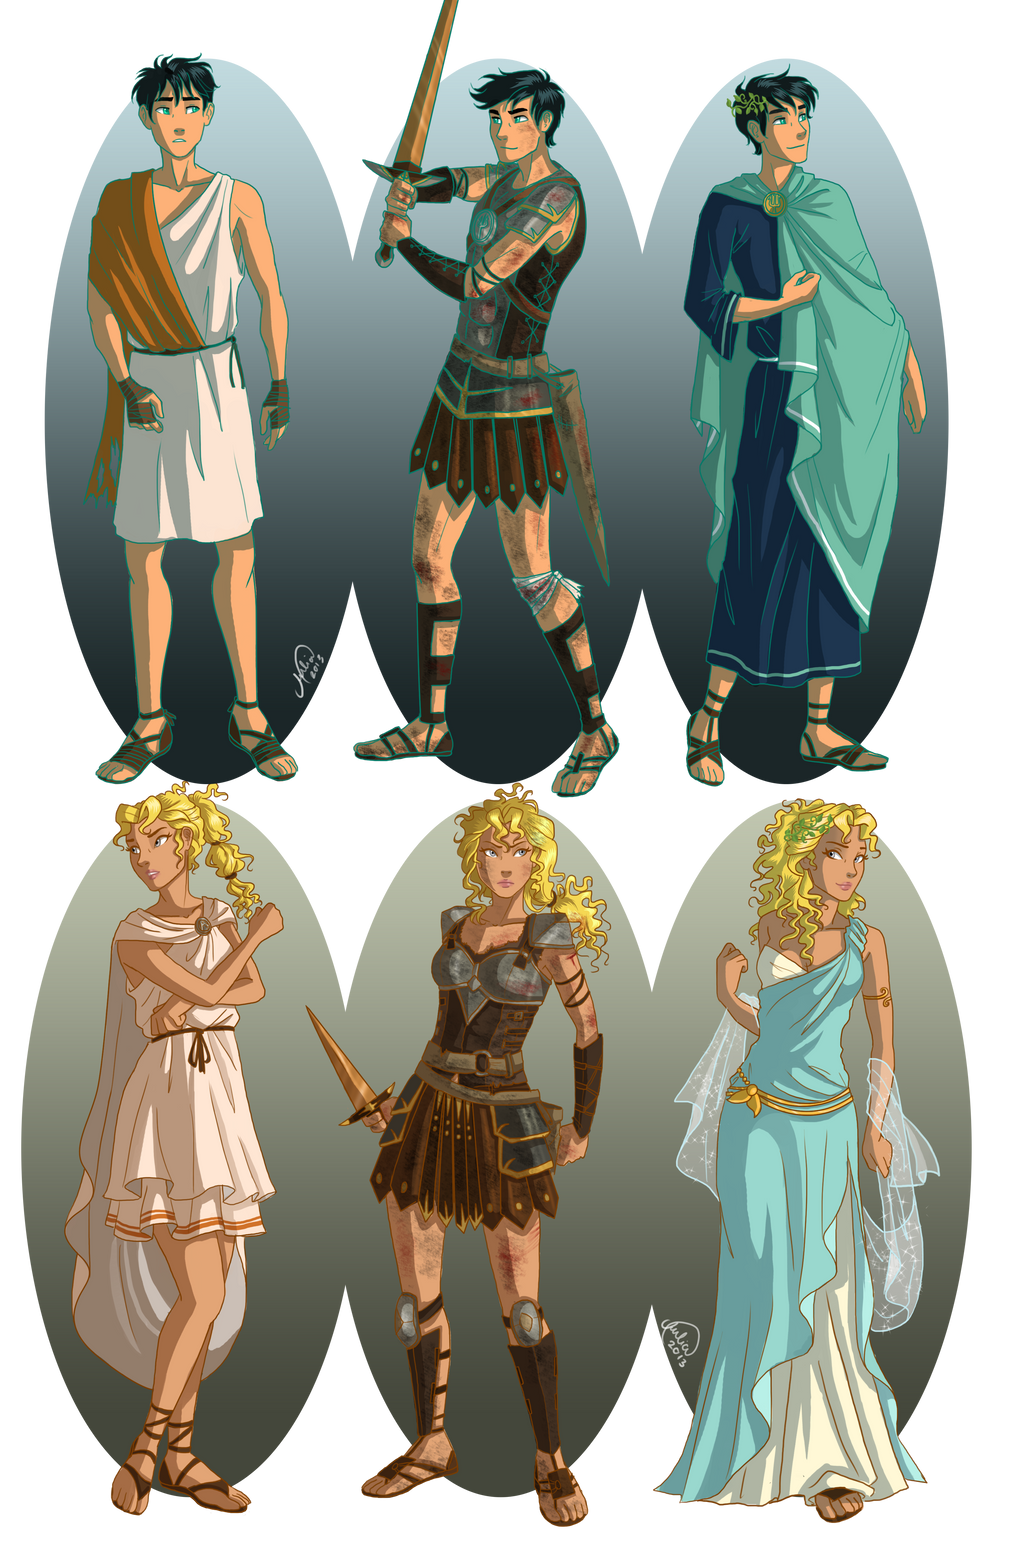 Ancient Greece by juliajm15